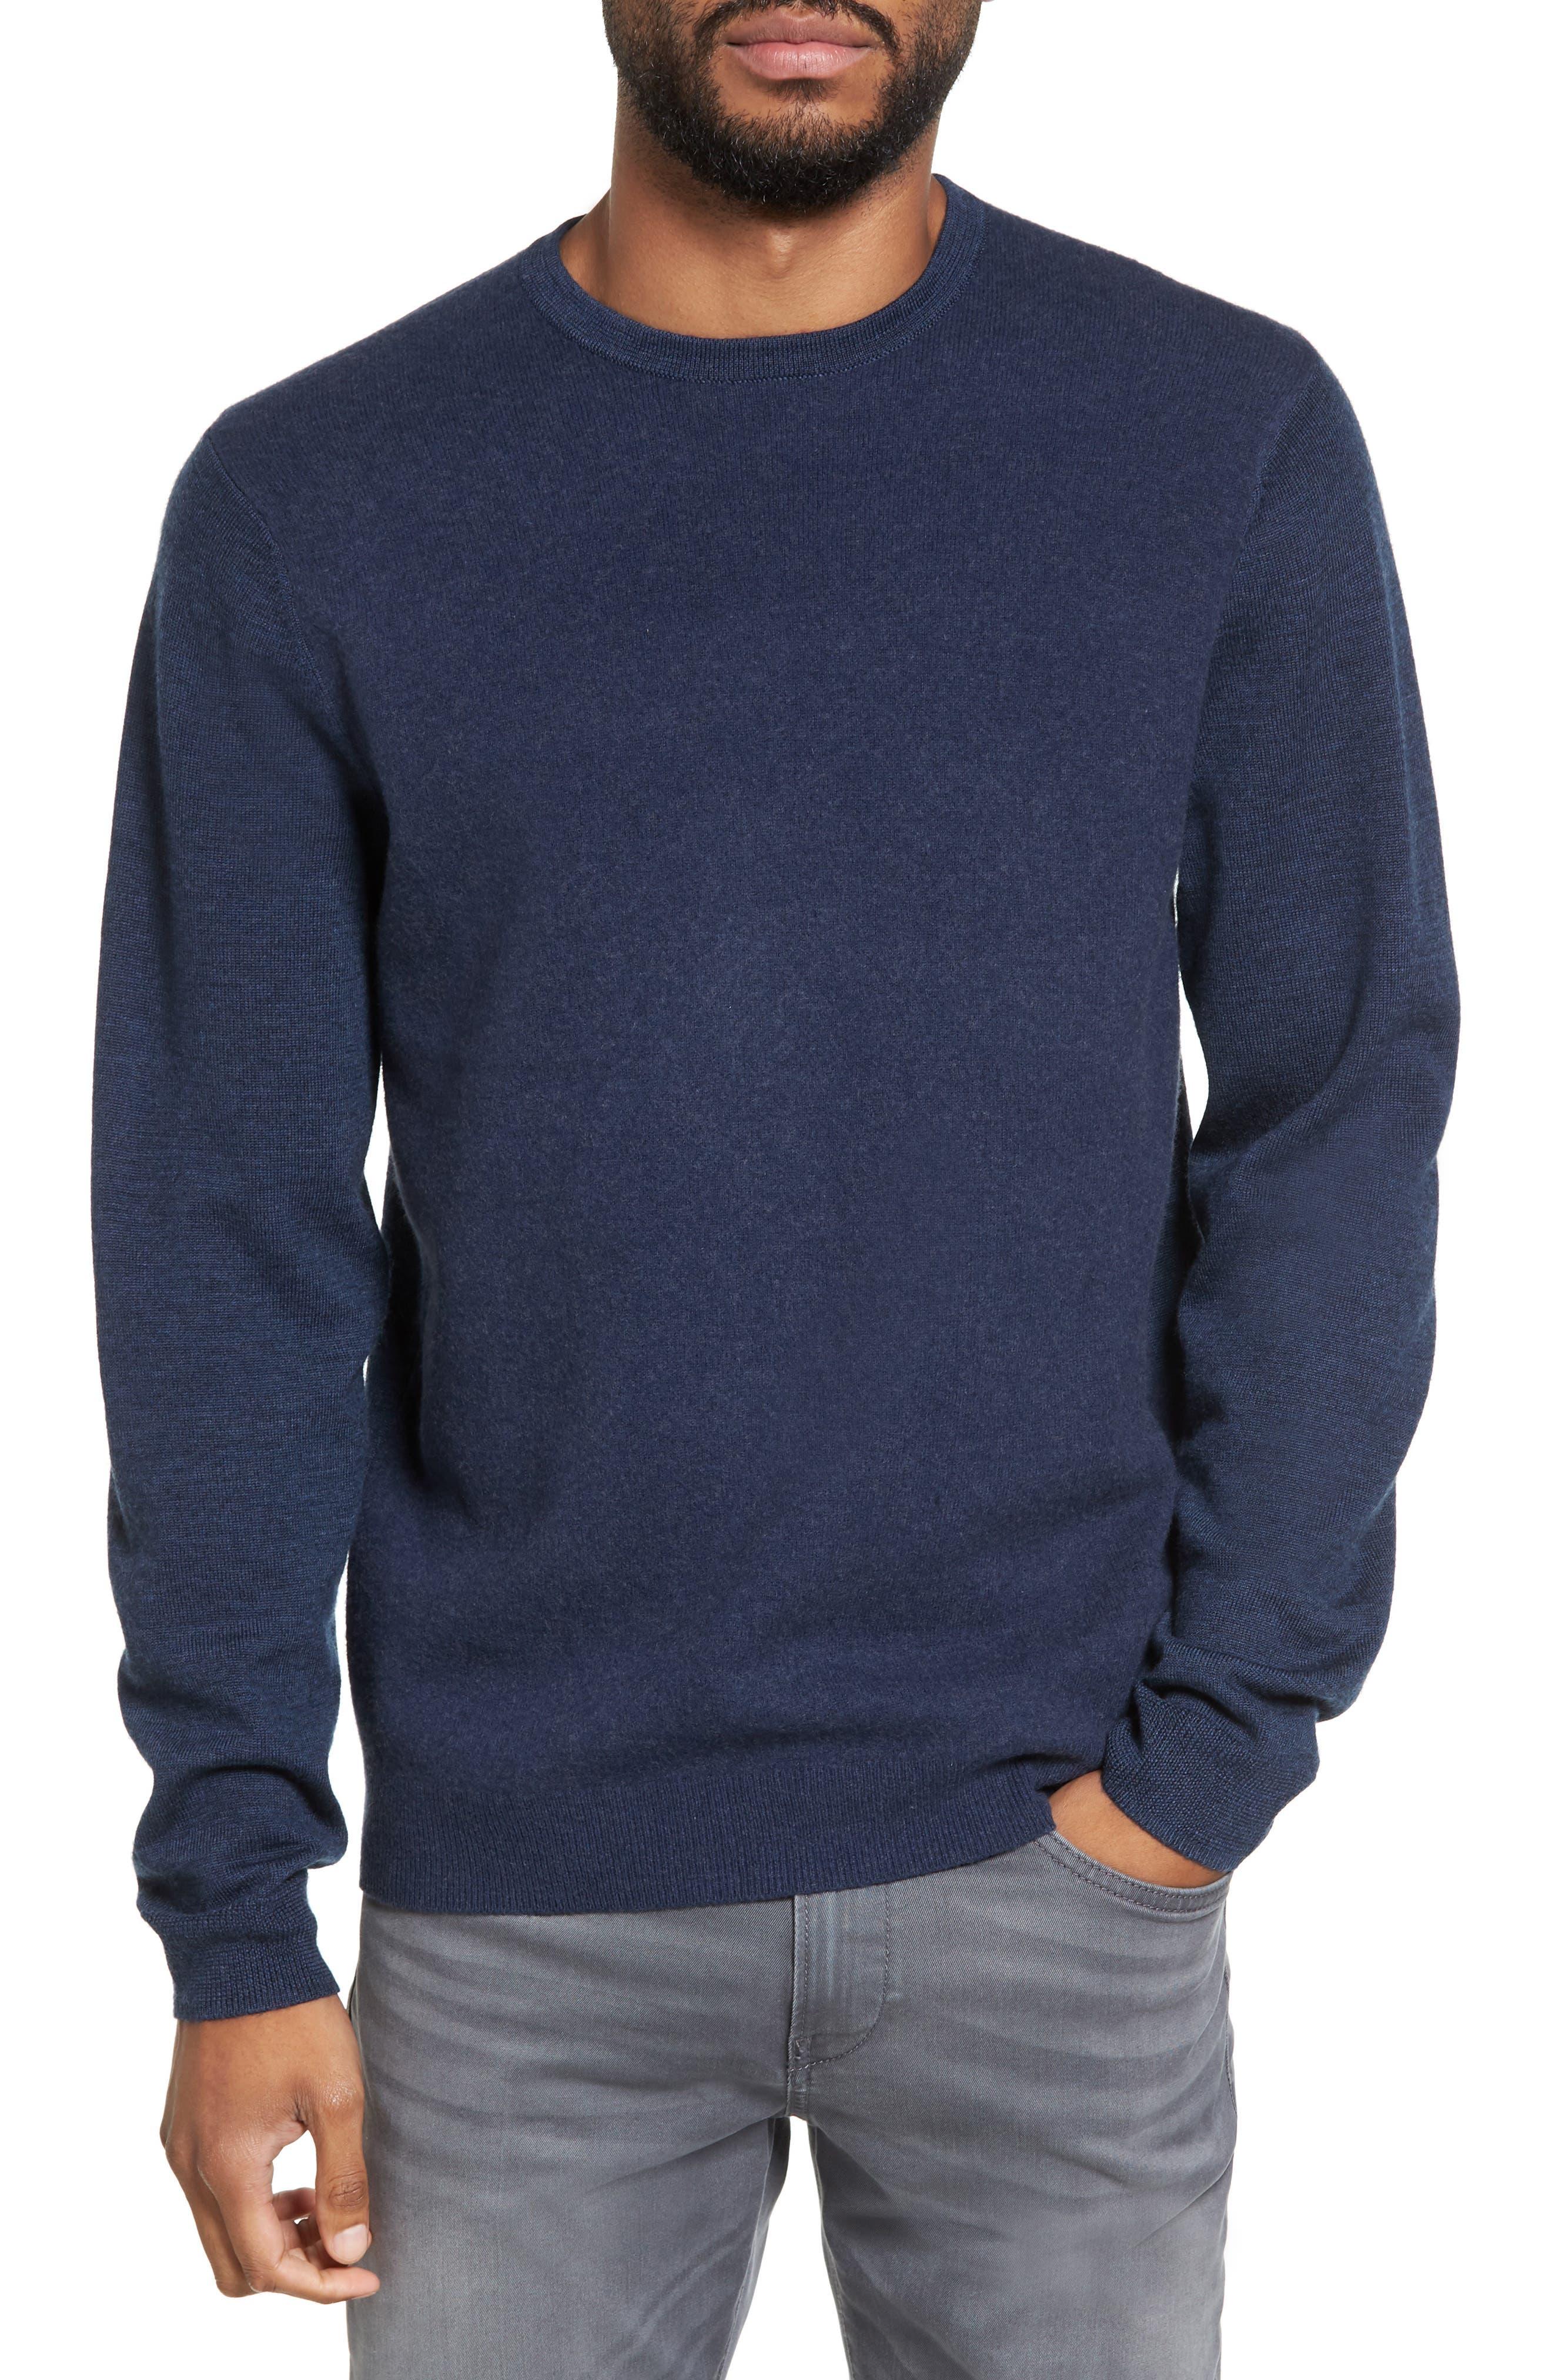 Merino Wool Blend Sweater,                             Main thumbnail 1, color,                             Navy Iris